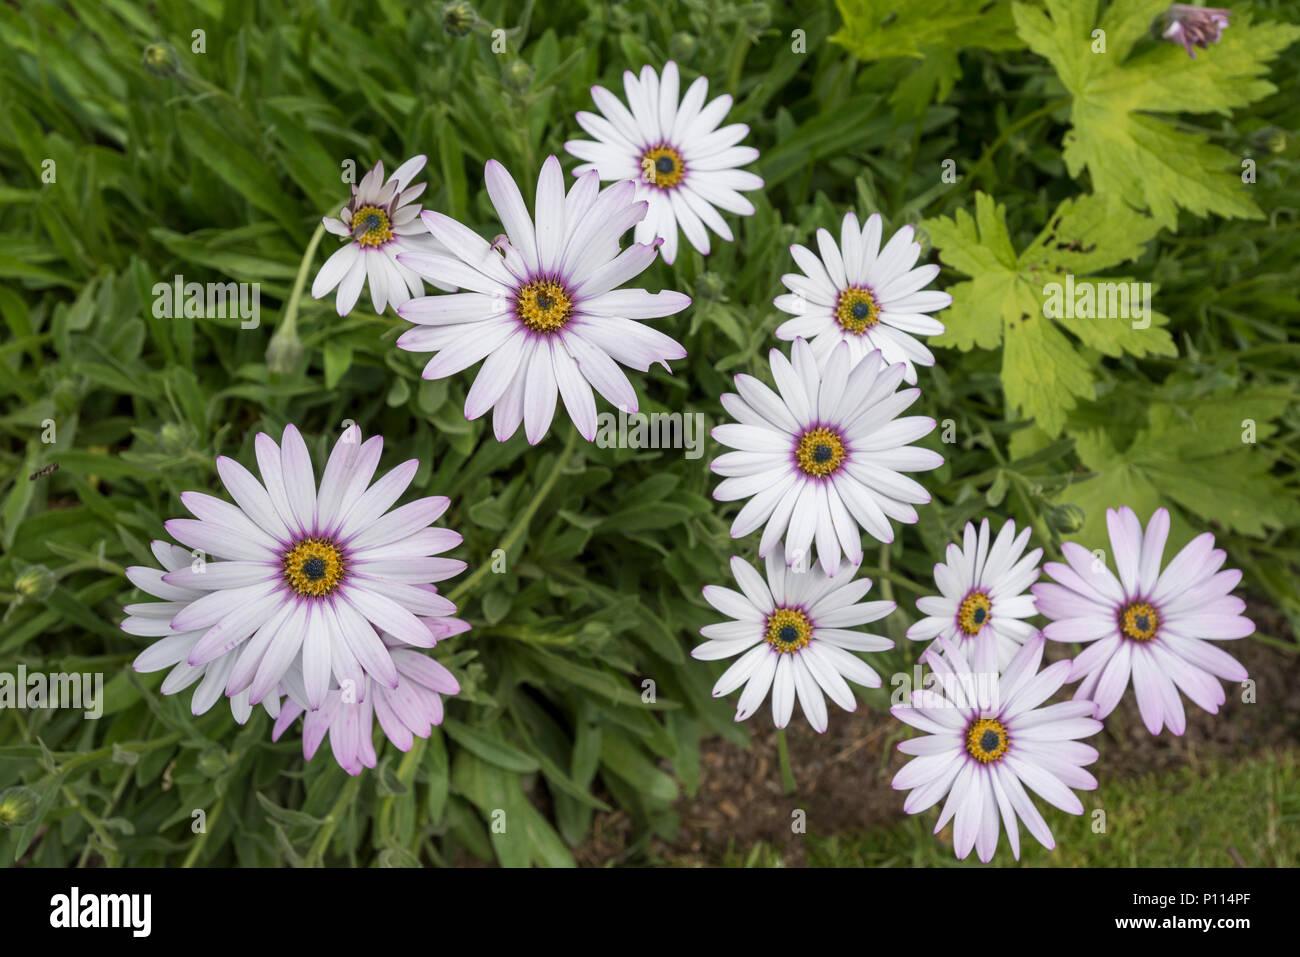 Daisy Type Flowers Osteospermum Plants Perennial Plant Stock Photo